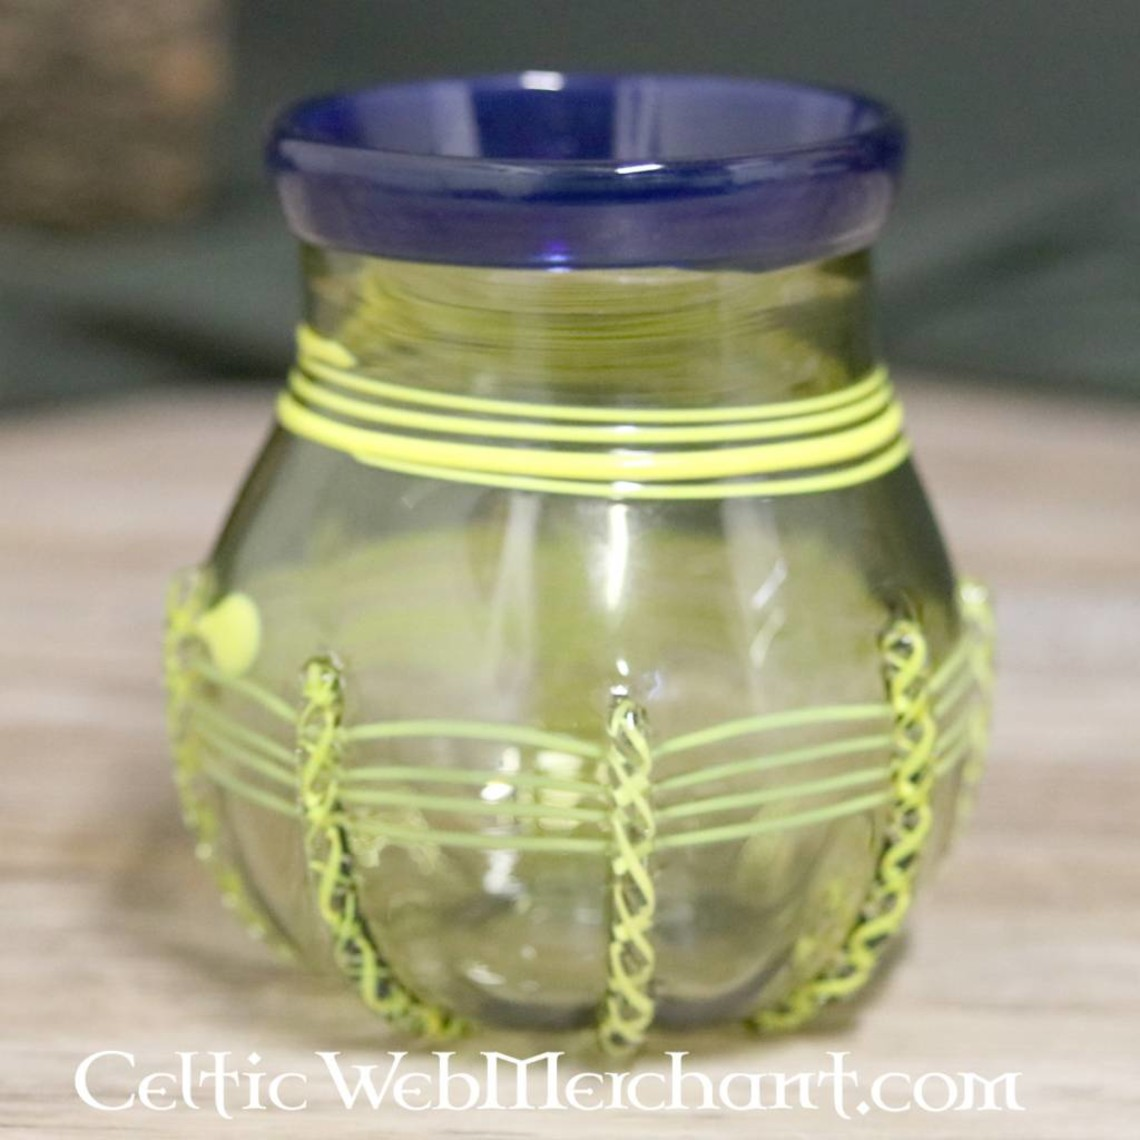 Decorated Birka glass, grave 649